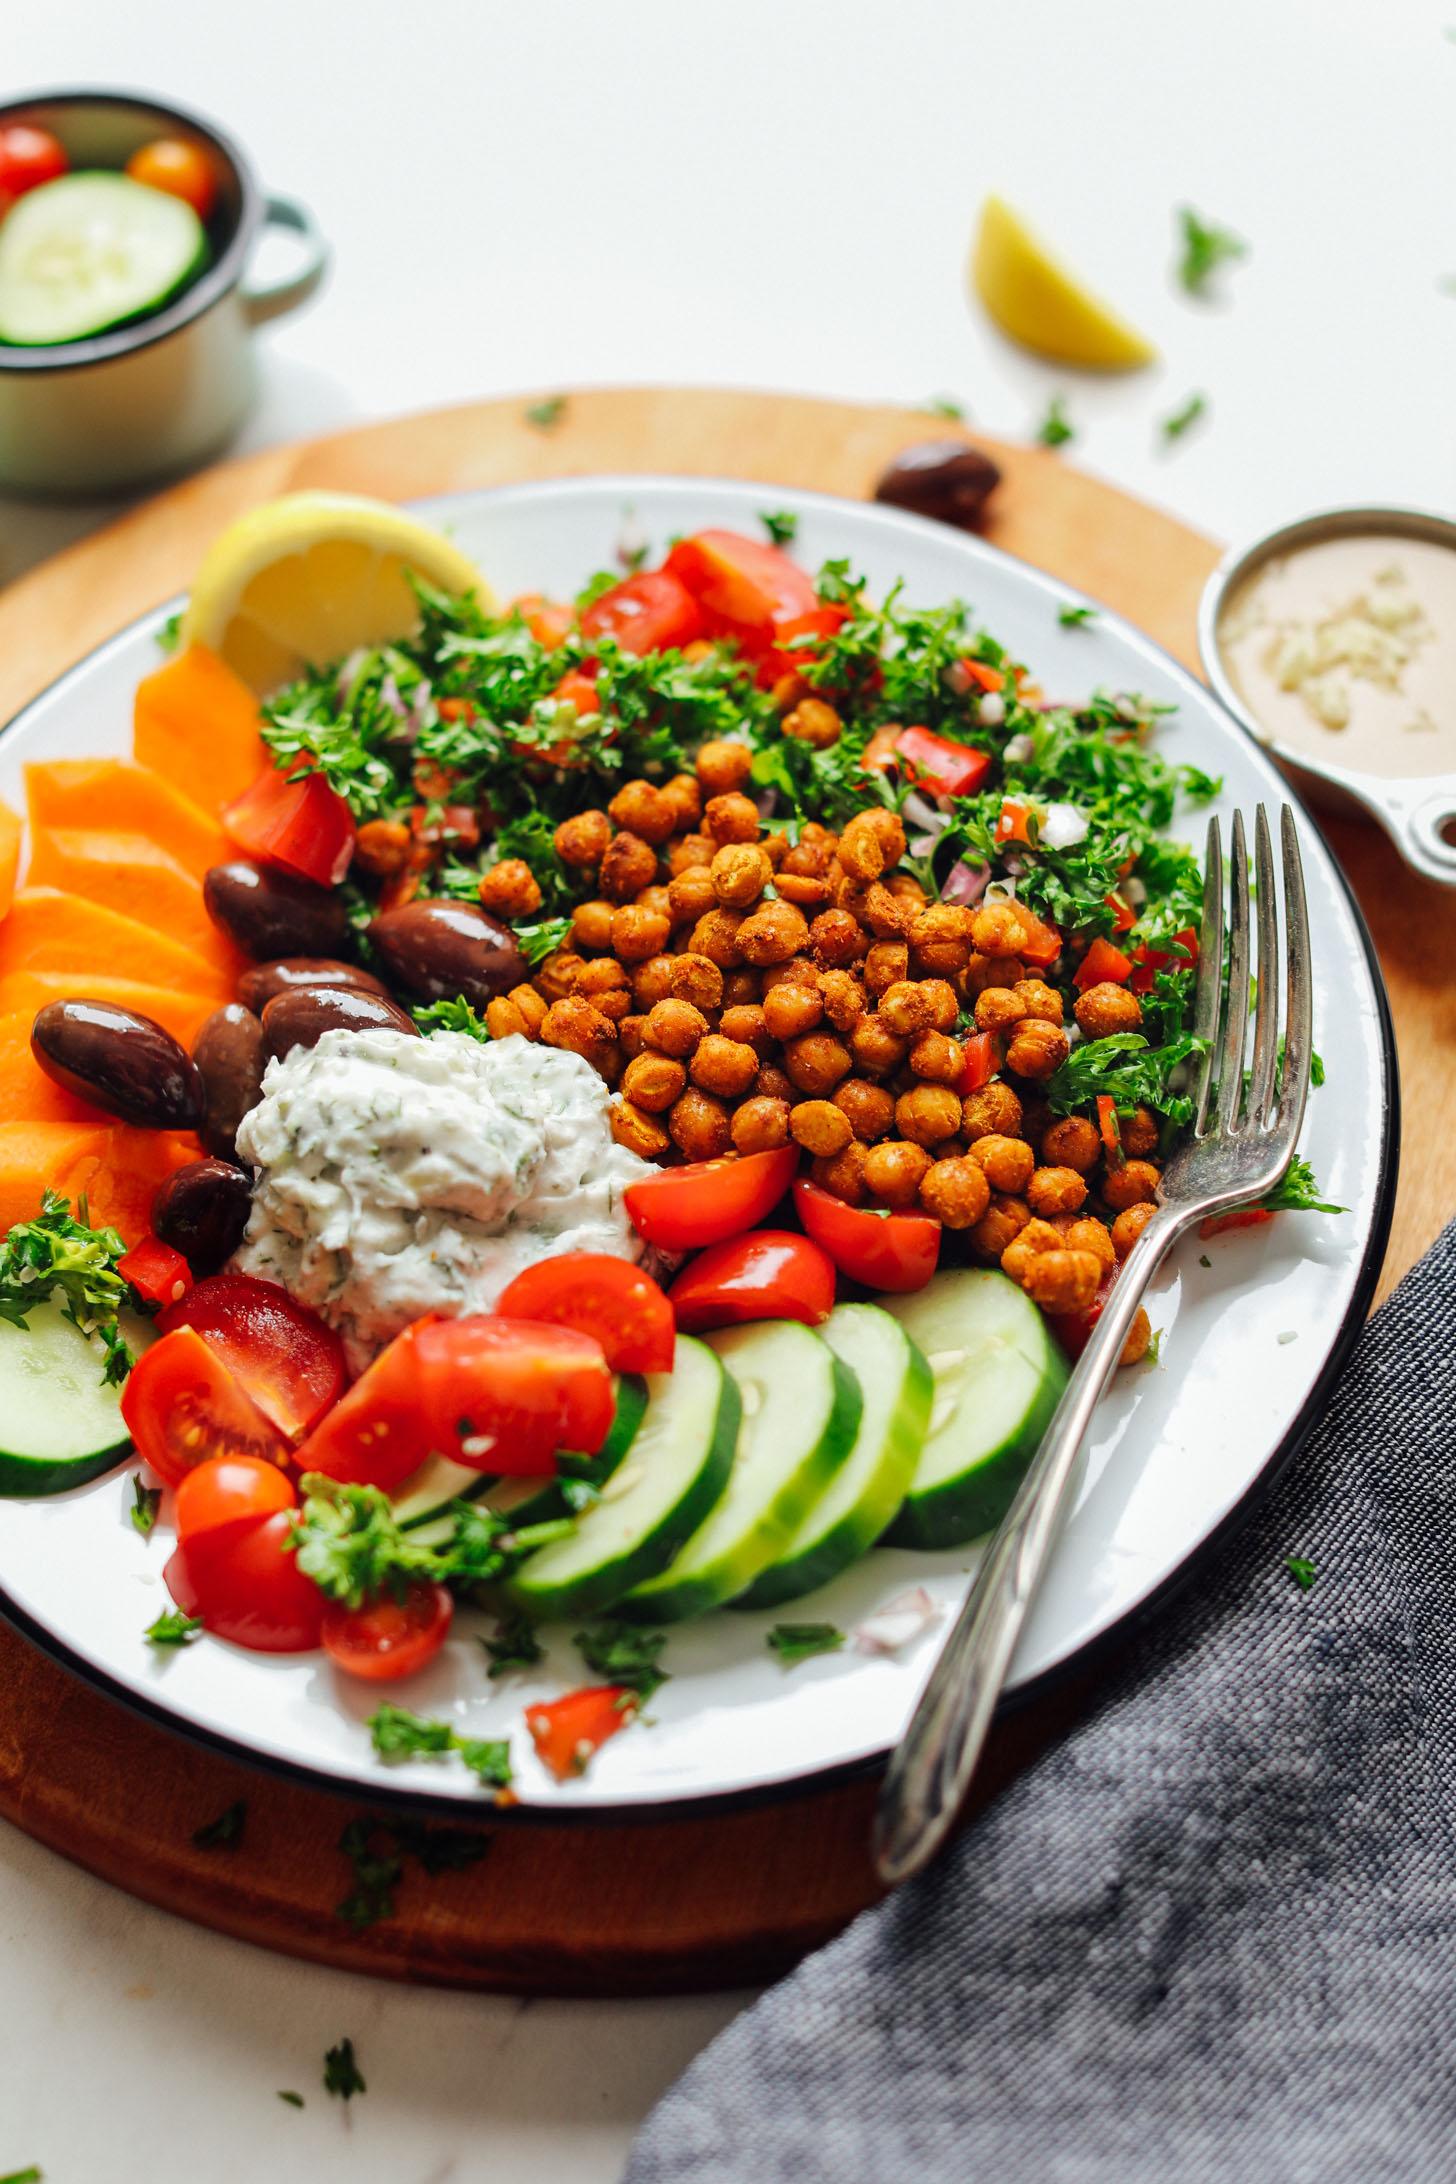 DELICIOUS Vegan Greek Bowl with Crispy Chickpeas, Vegan Tzatziki, and Veggies! 30 minutes #chickpeas #salad #recipe #vegan #glutenfree #minimalistbaker